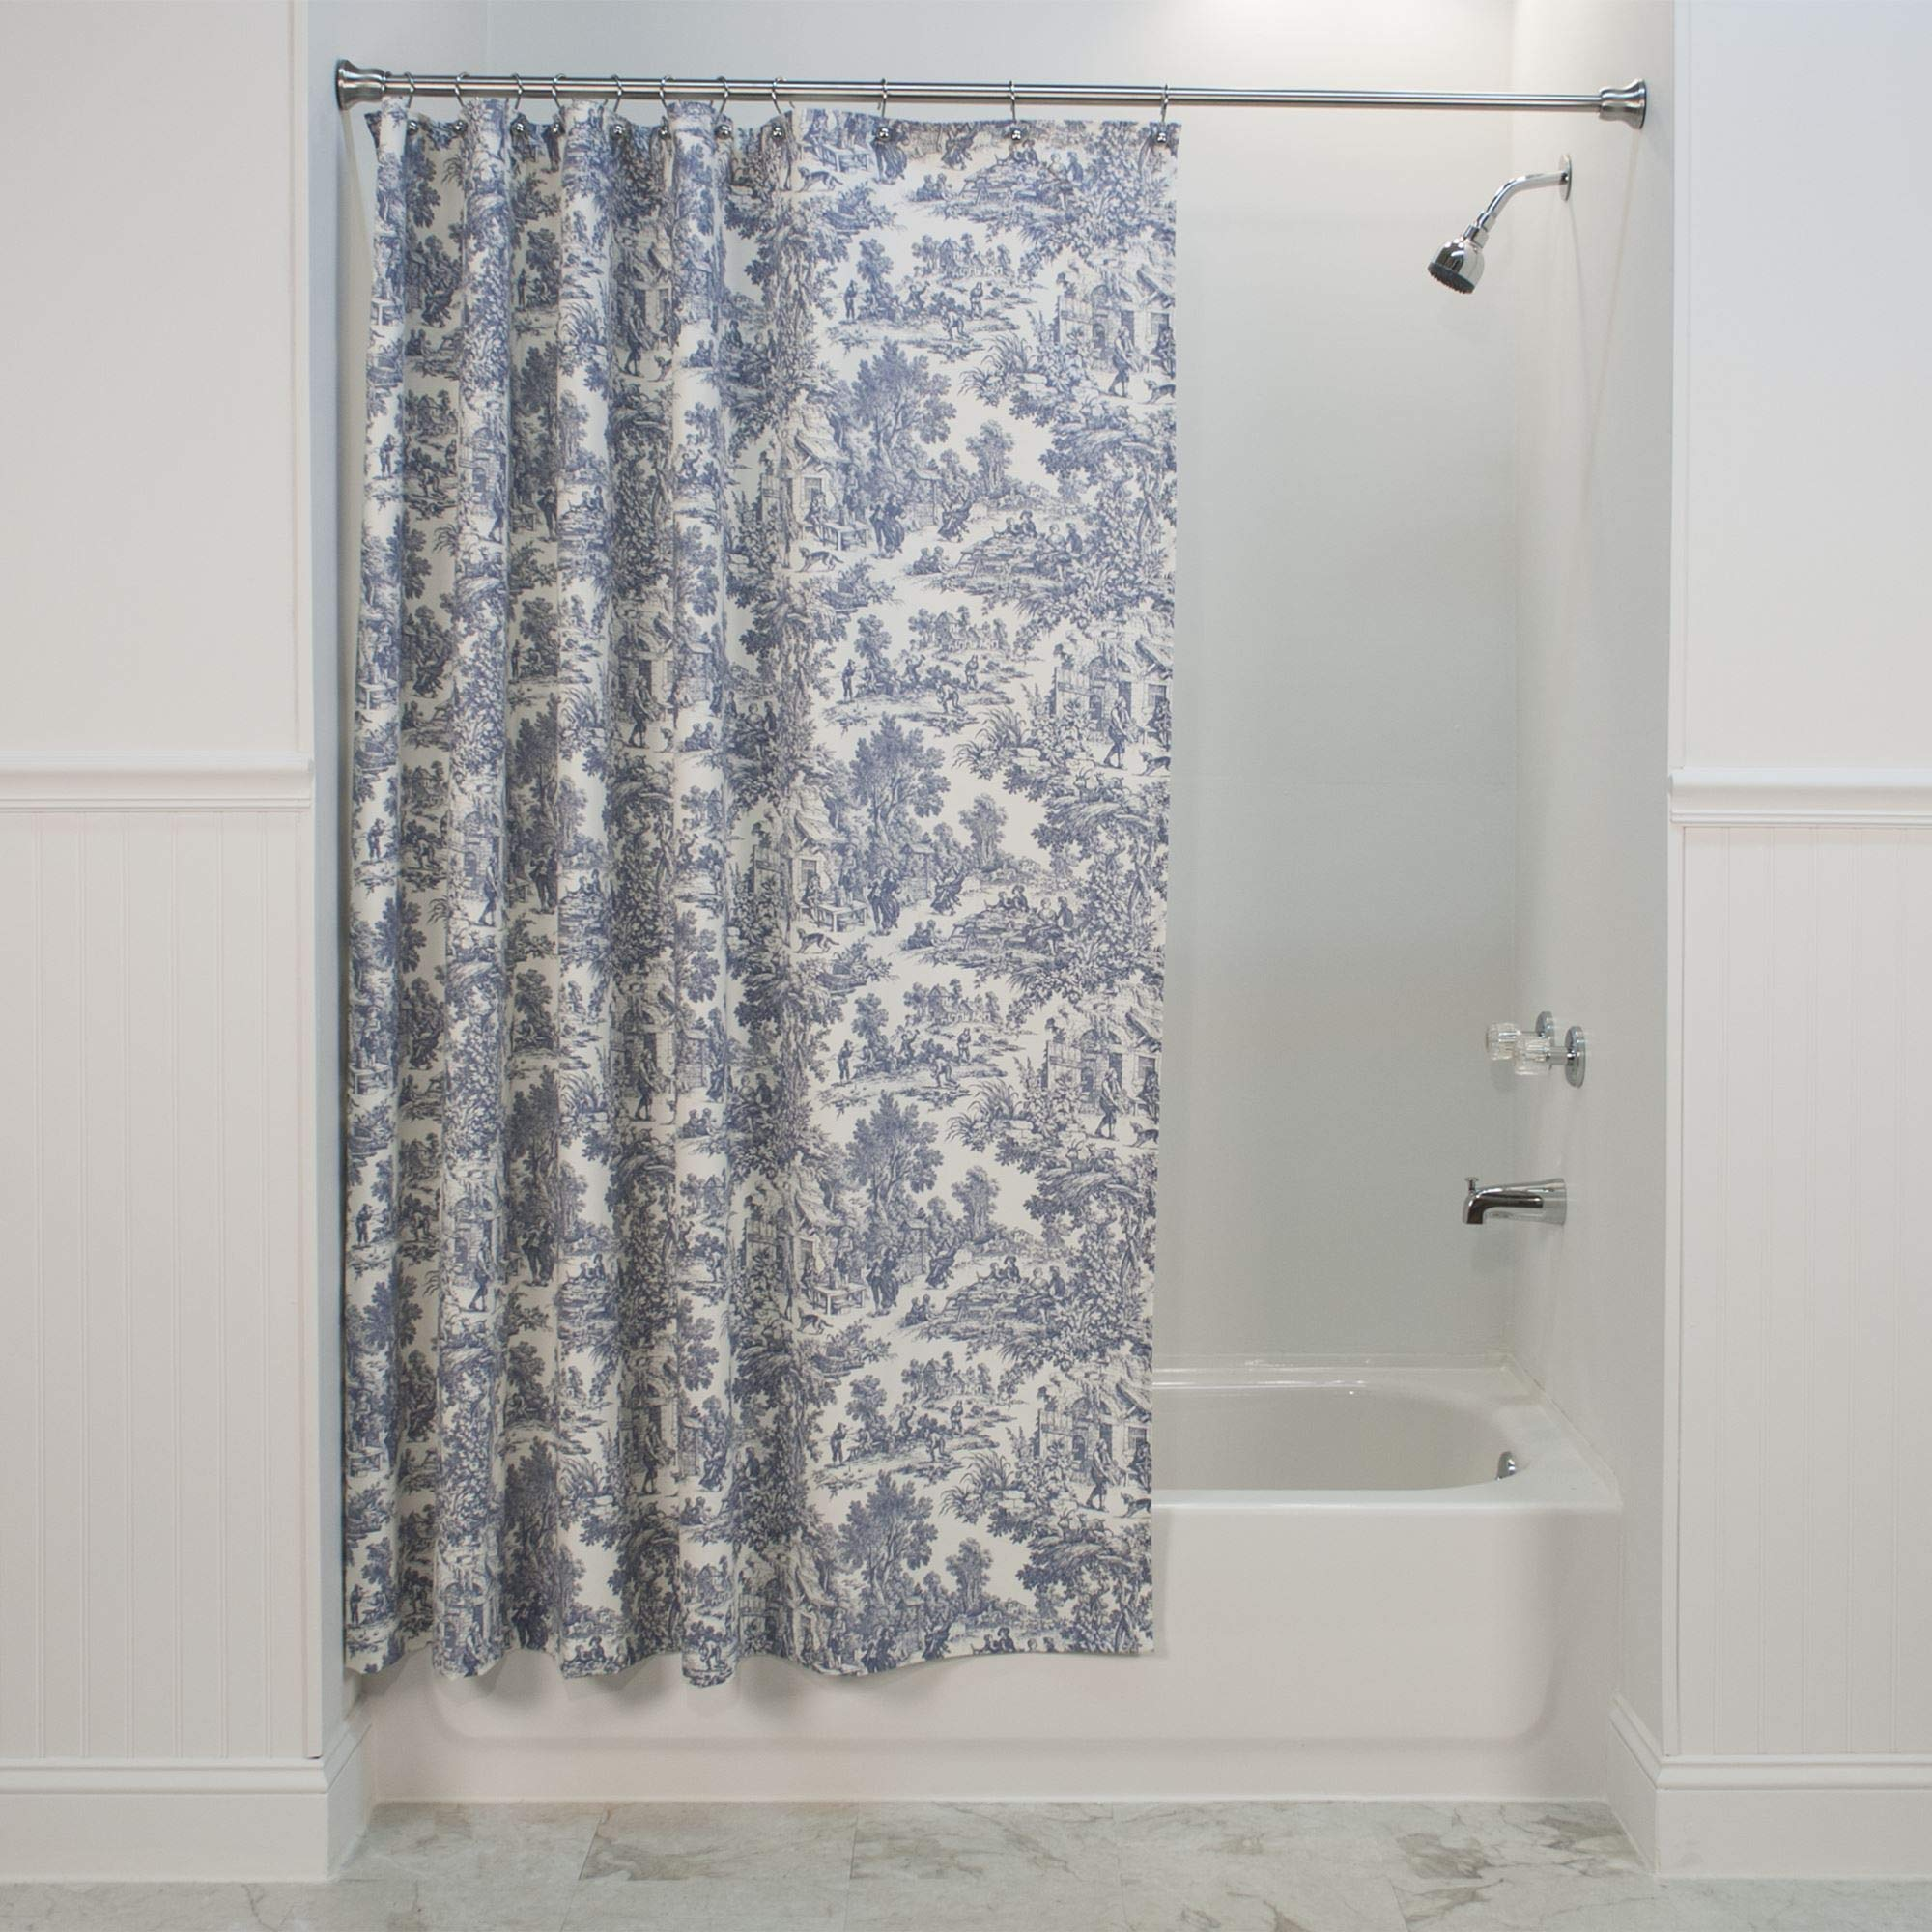 Victoria Park Toile Bathroom Shower Curtain, Blue